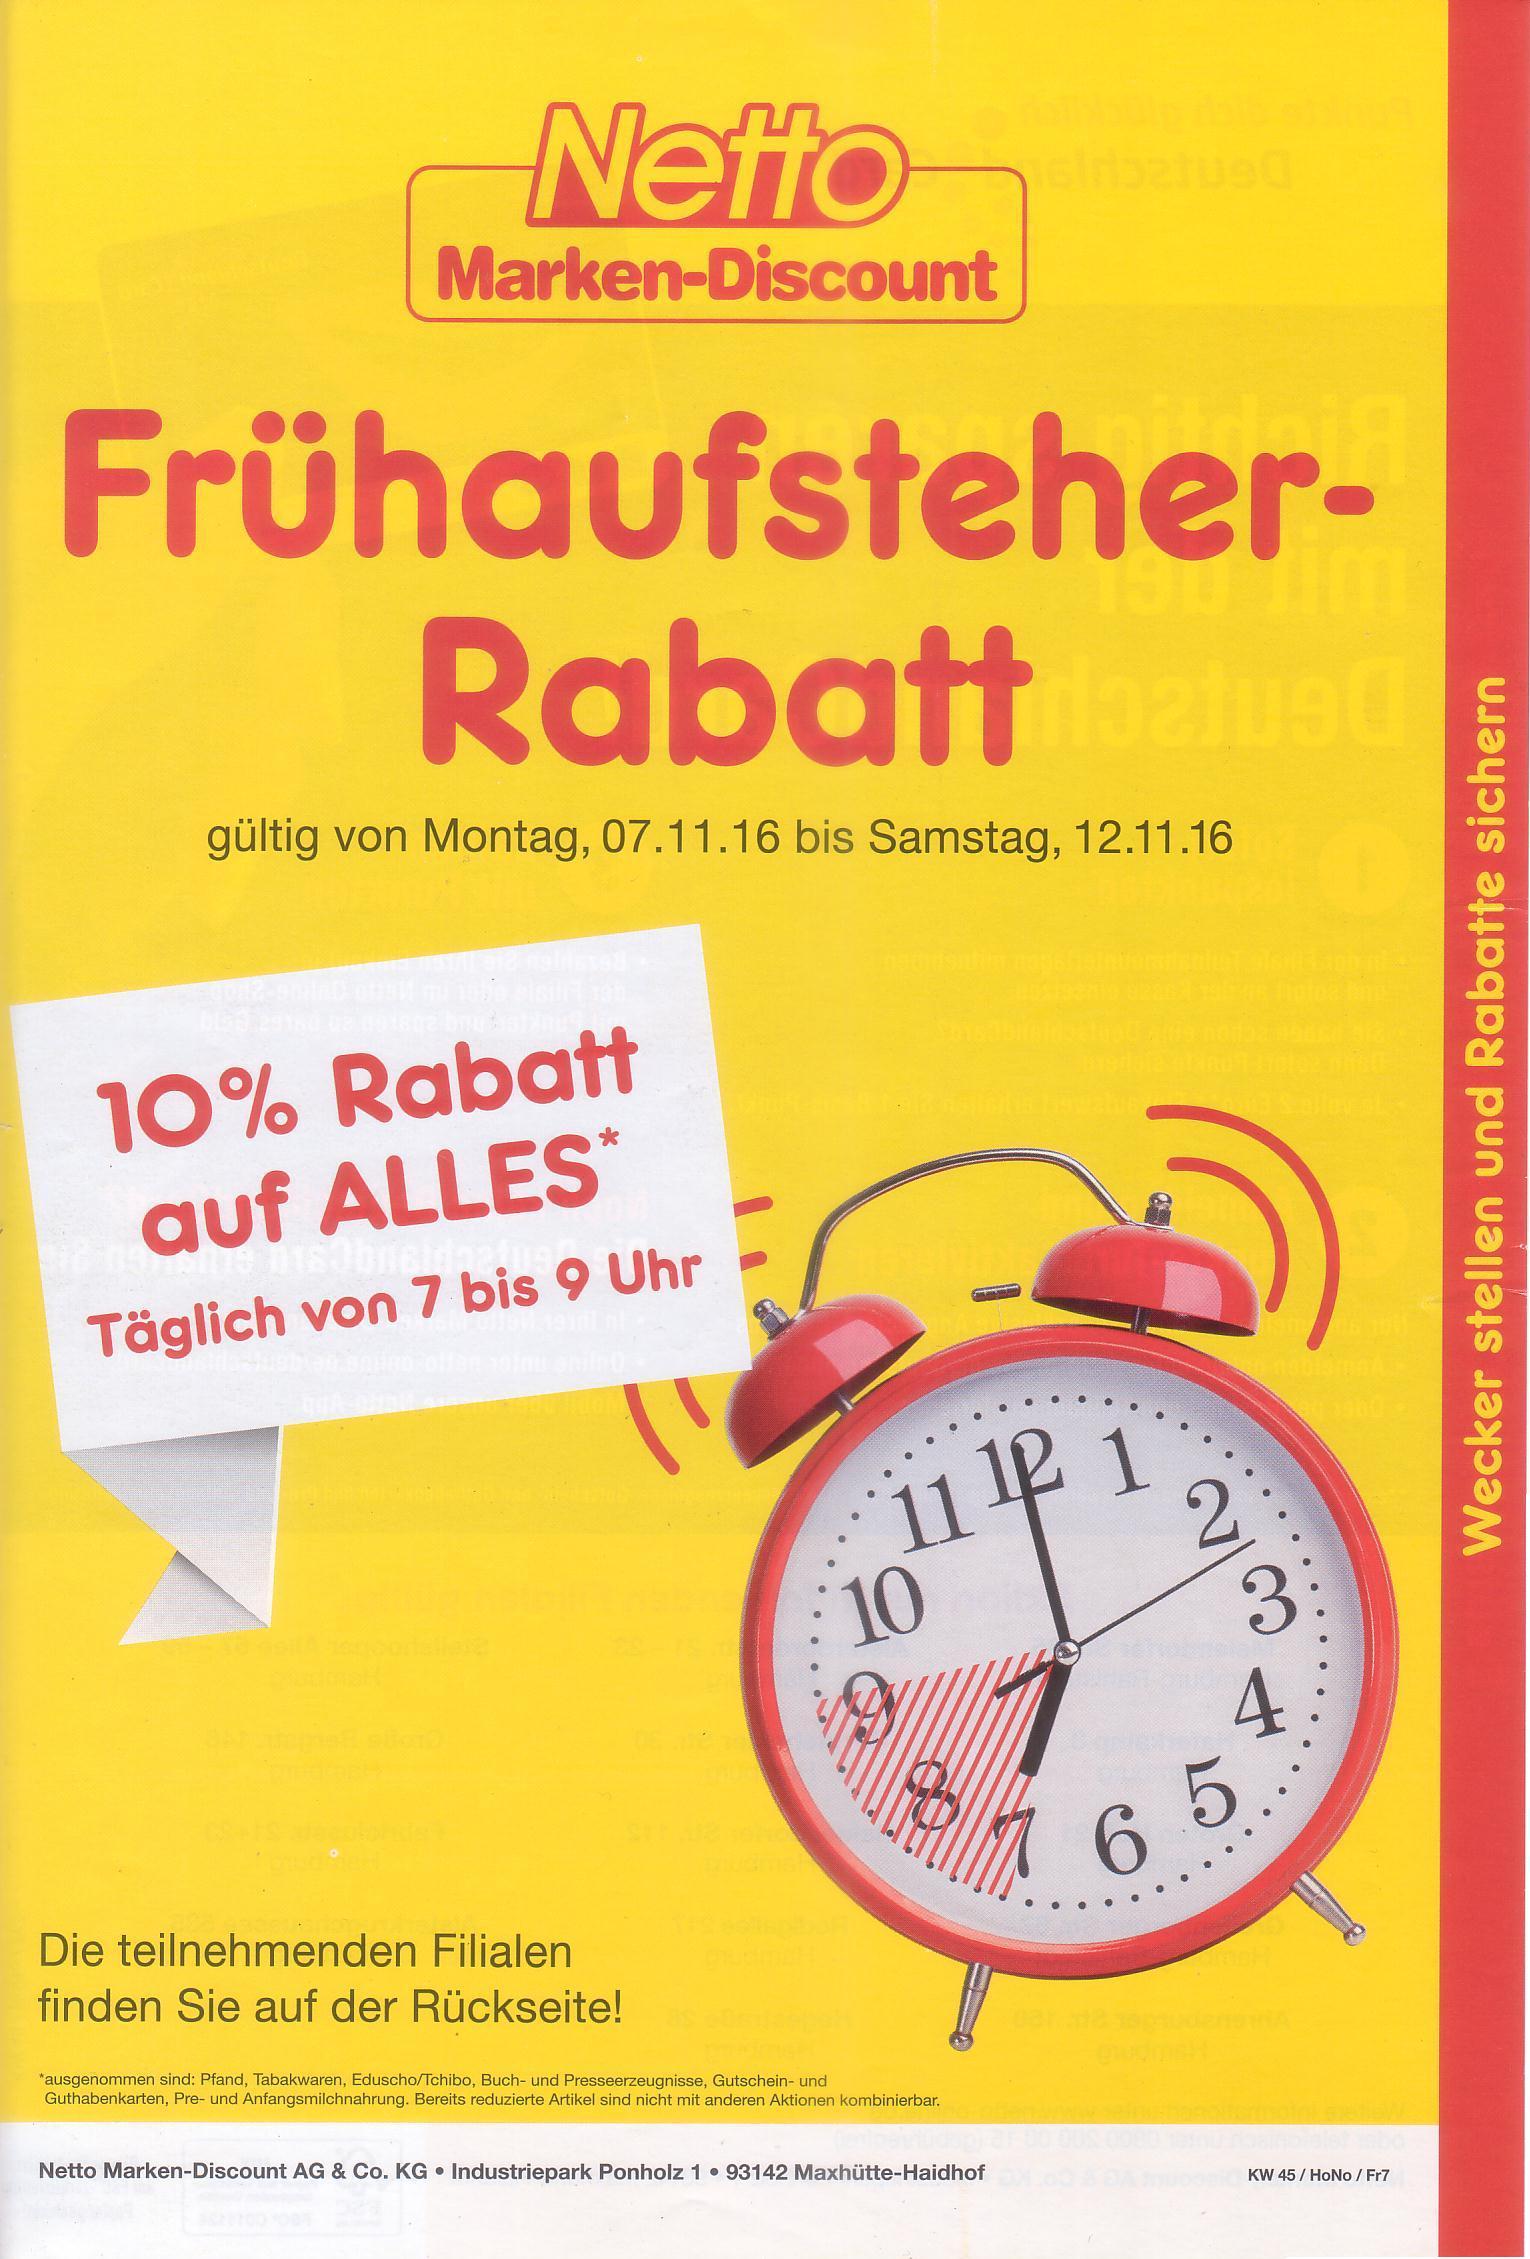 [LOKAL Hamburg] Netto MD Frühaufsteherrabbat -10% ganze KW. zb. 6x Puszta/Pickles/Sellerie statt 4,14 für 2,94 EU